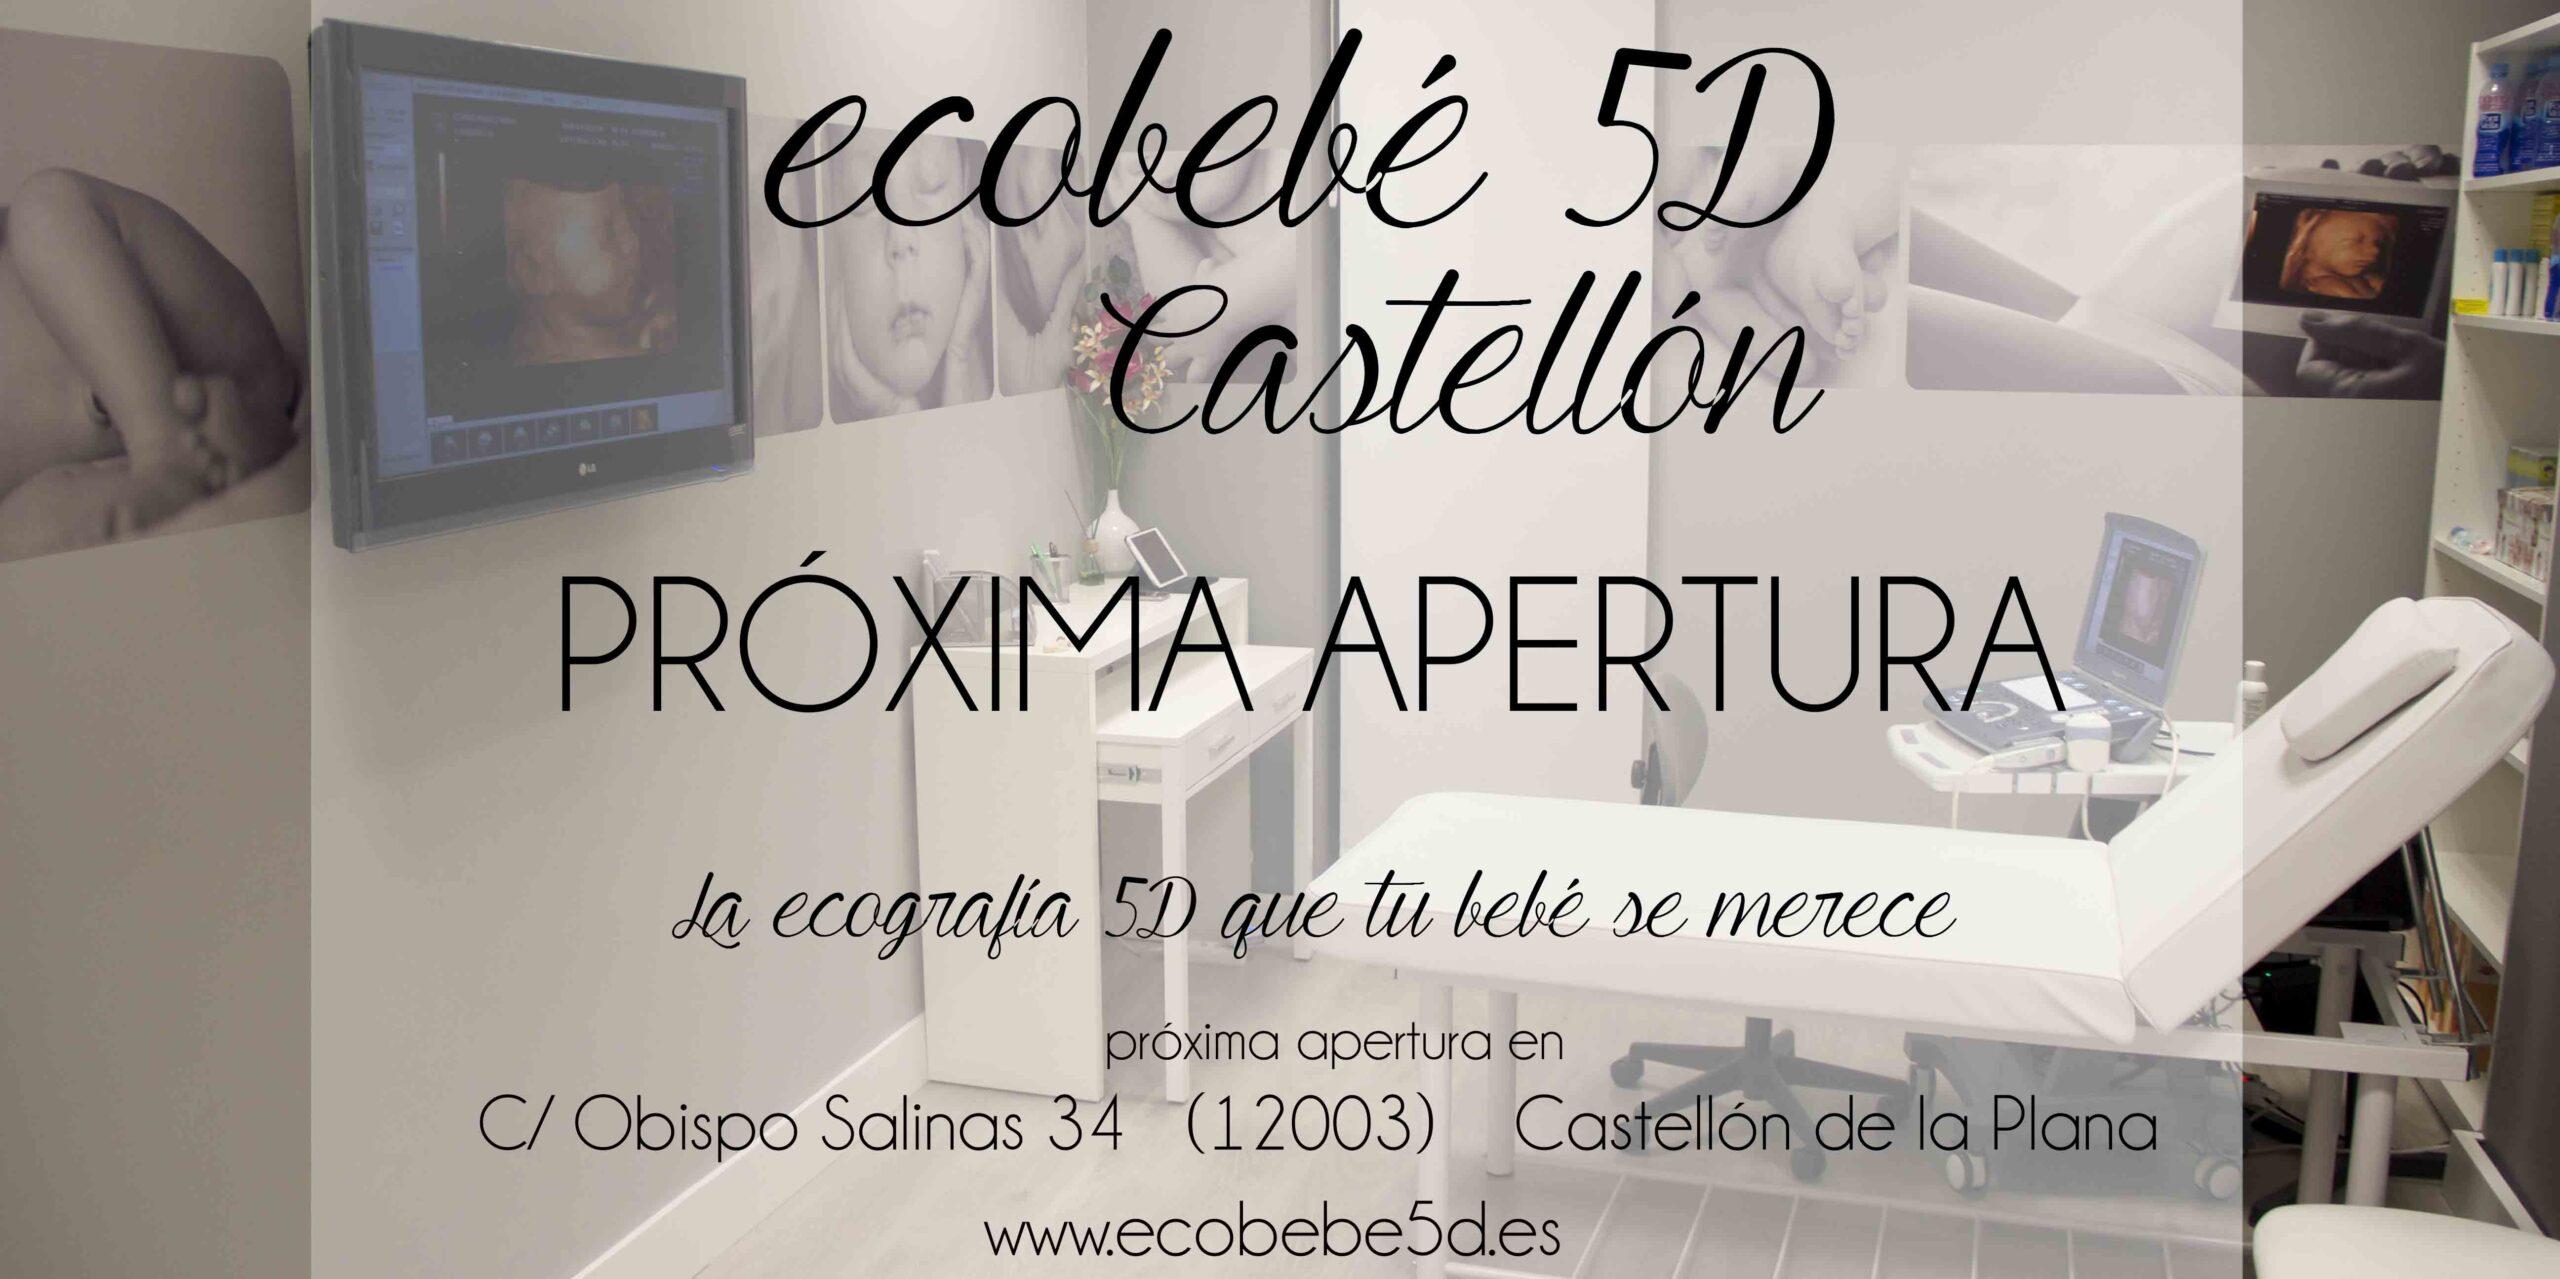 nuevo centro ecobebé 5D Castellón